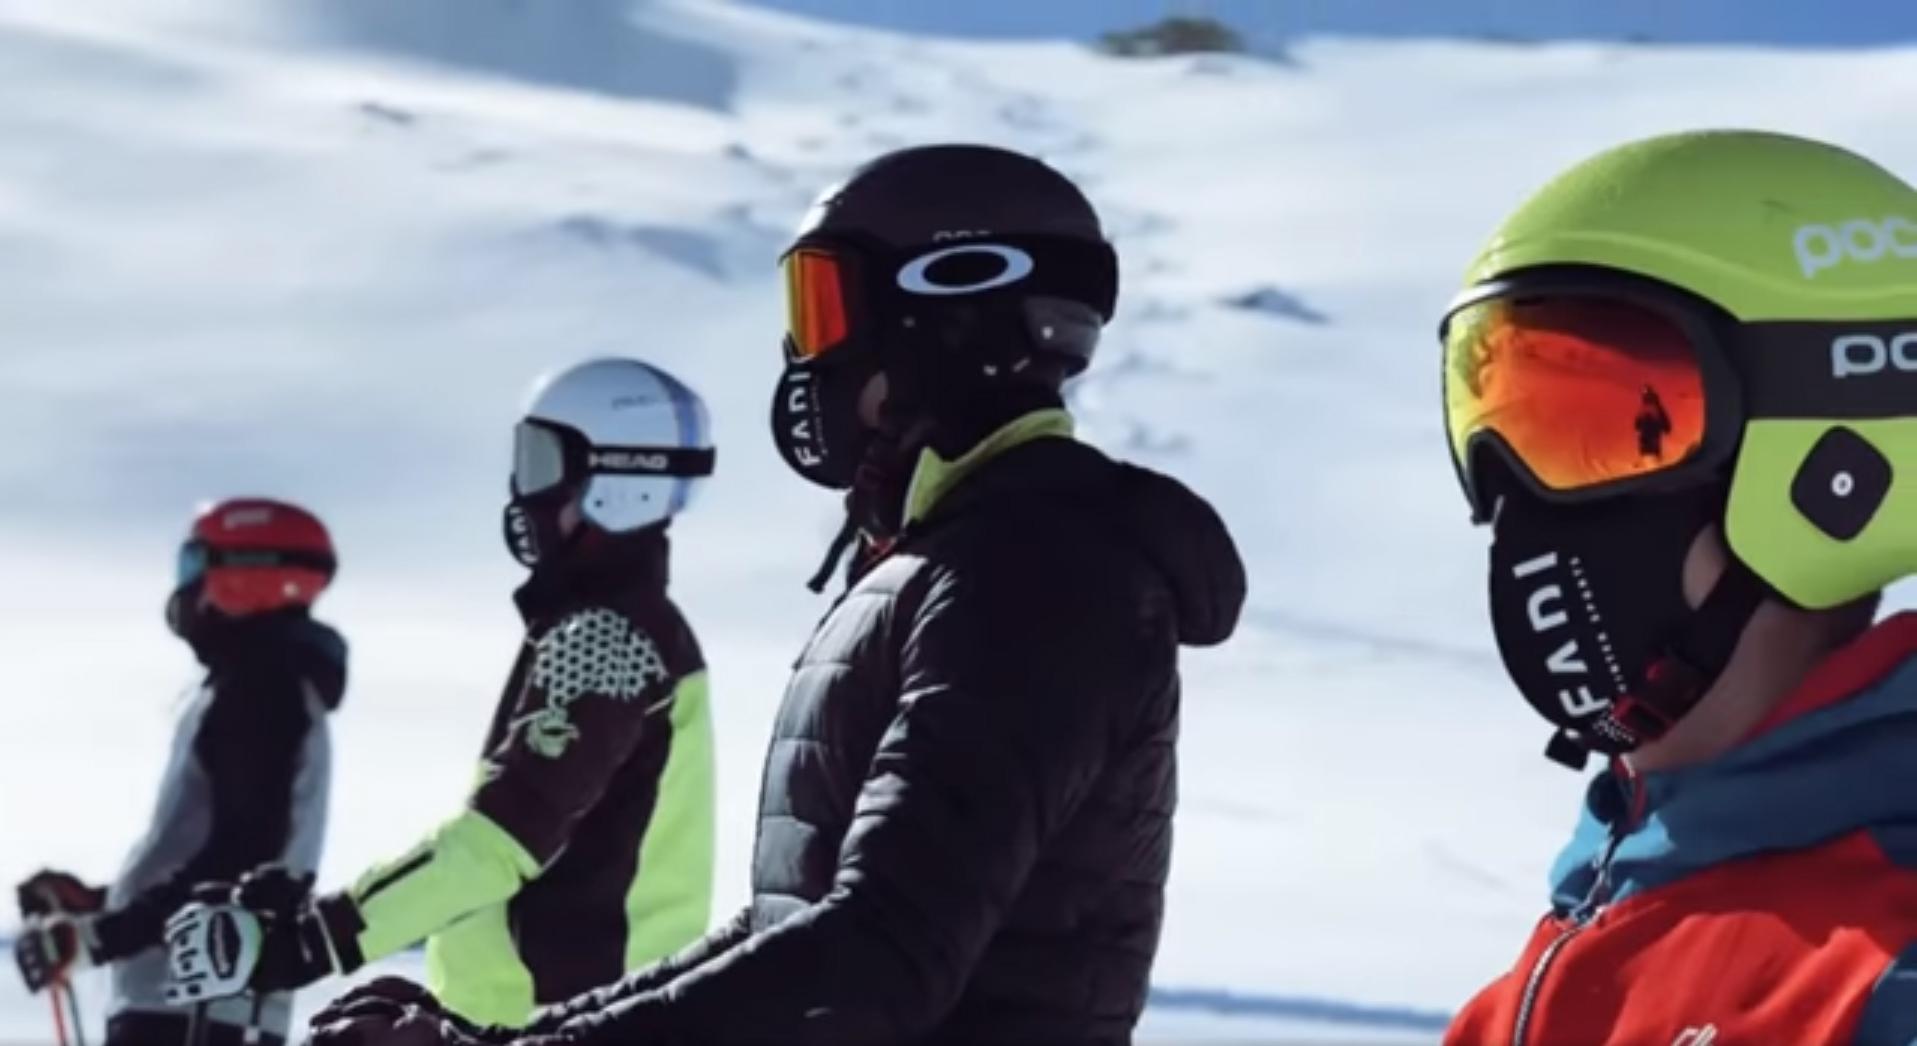 El grupo CETDI Freeski de Skicross se concentra en Sierra Nevada